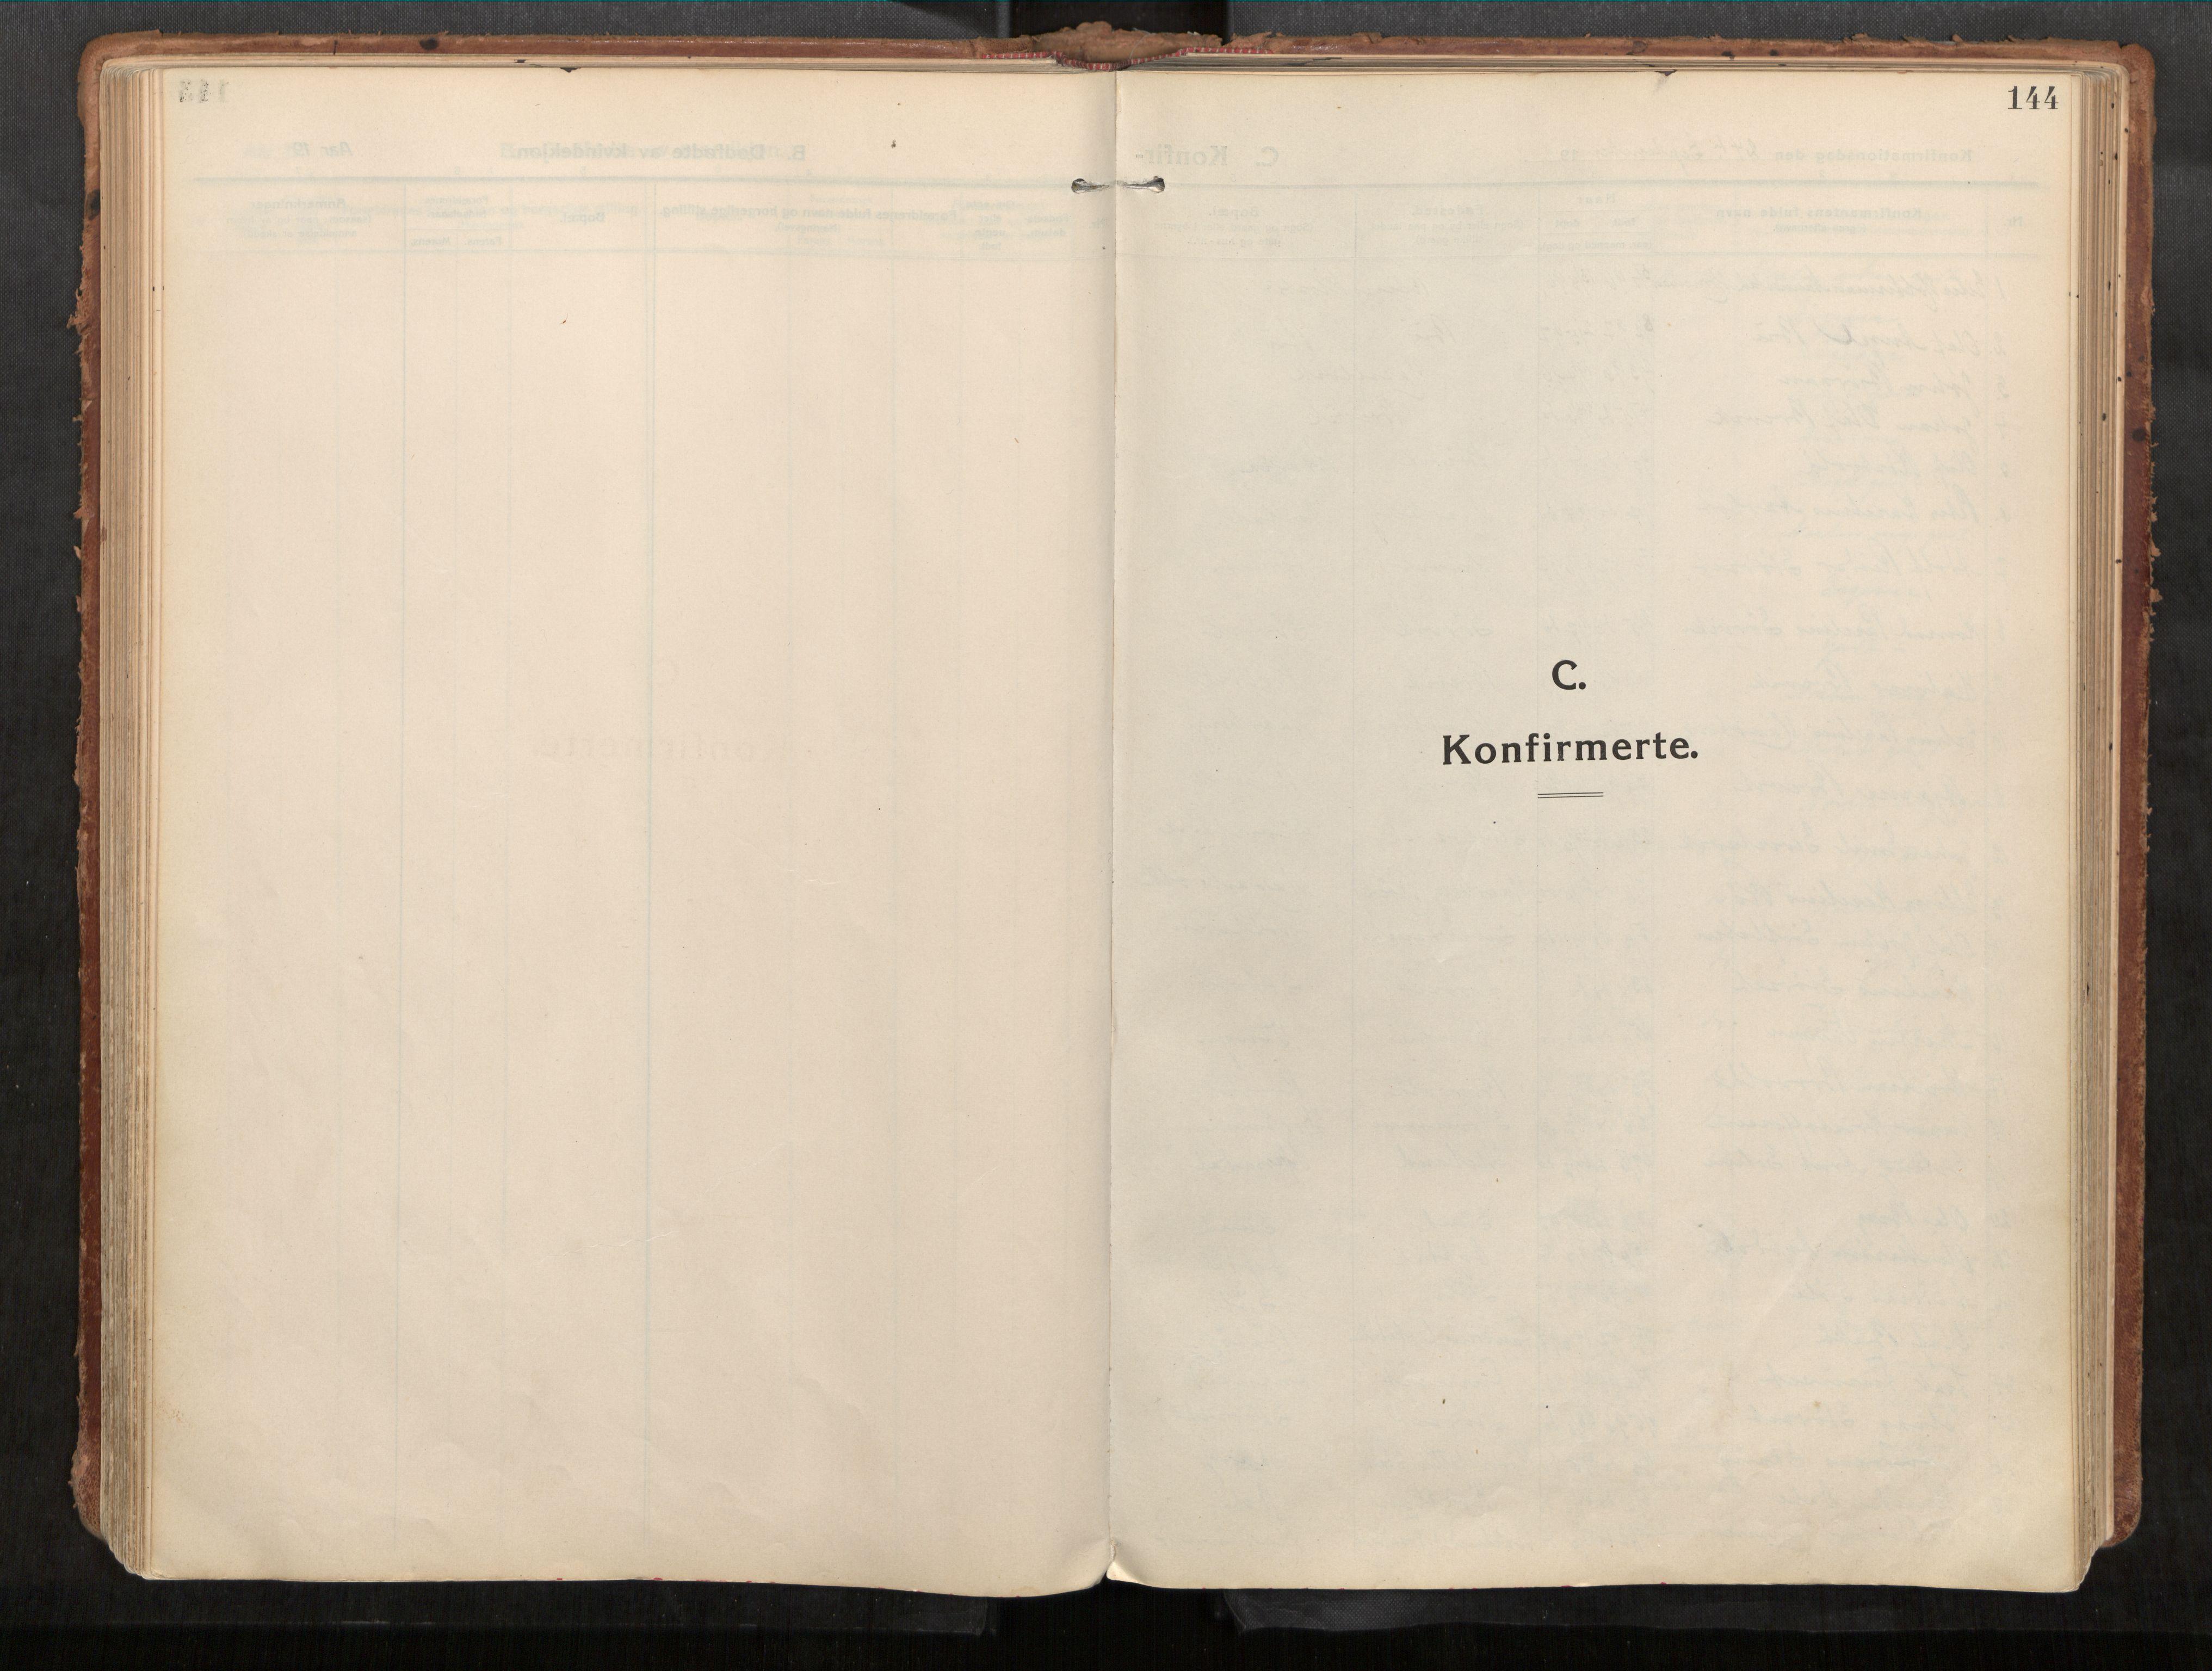 SAT, Stadsbygd sokneprestkontor, I/I1/I1a/L0001: Parish register (official) no. 1, 1911-1929, p. 144